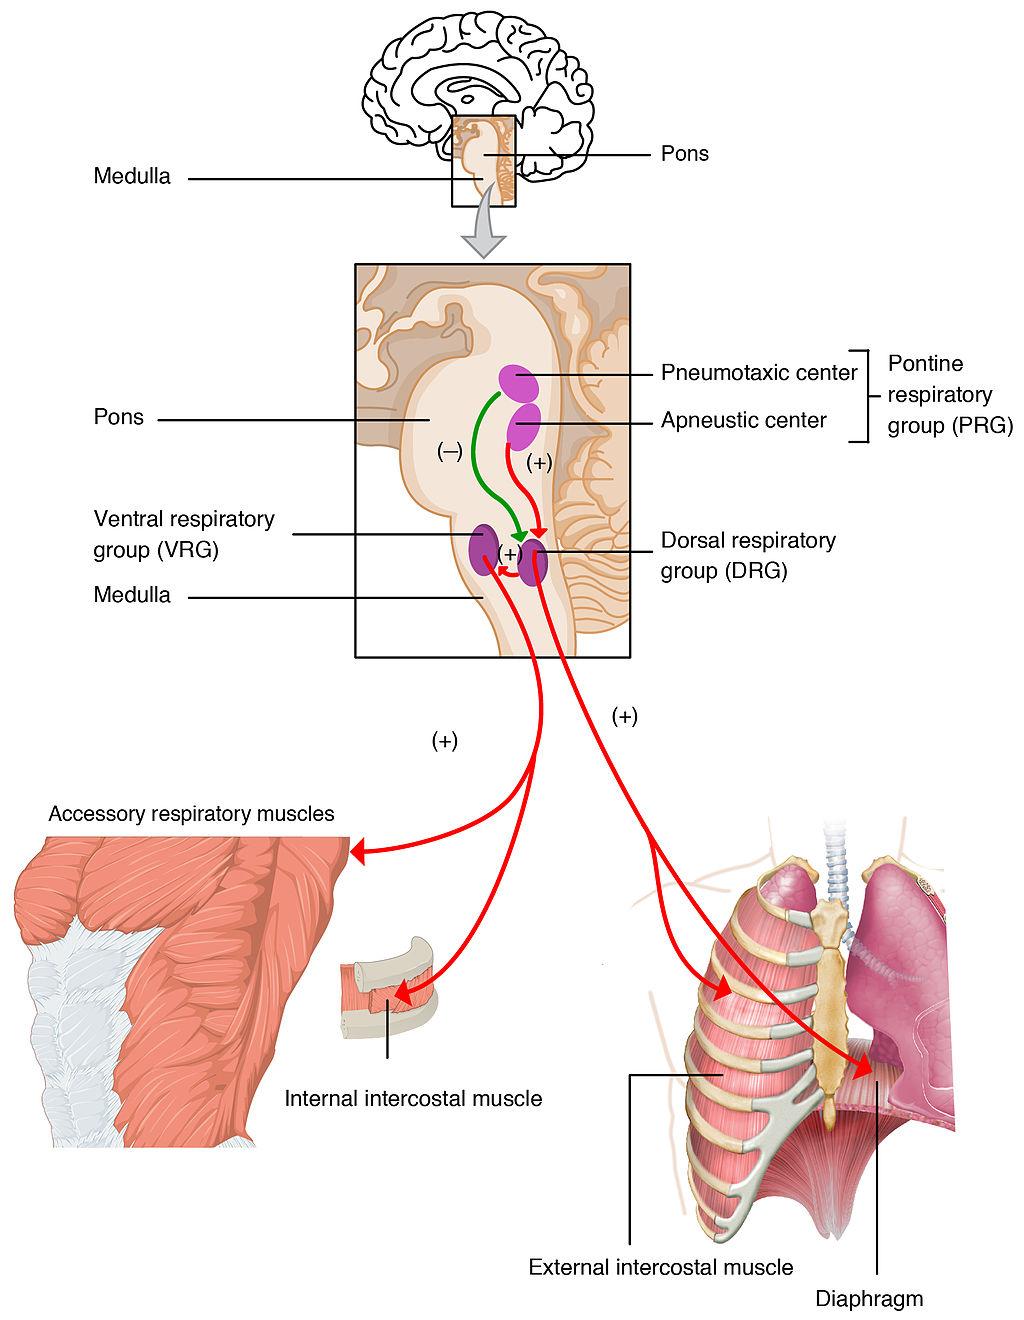 13.3.4 Nervous Control of Respiration